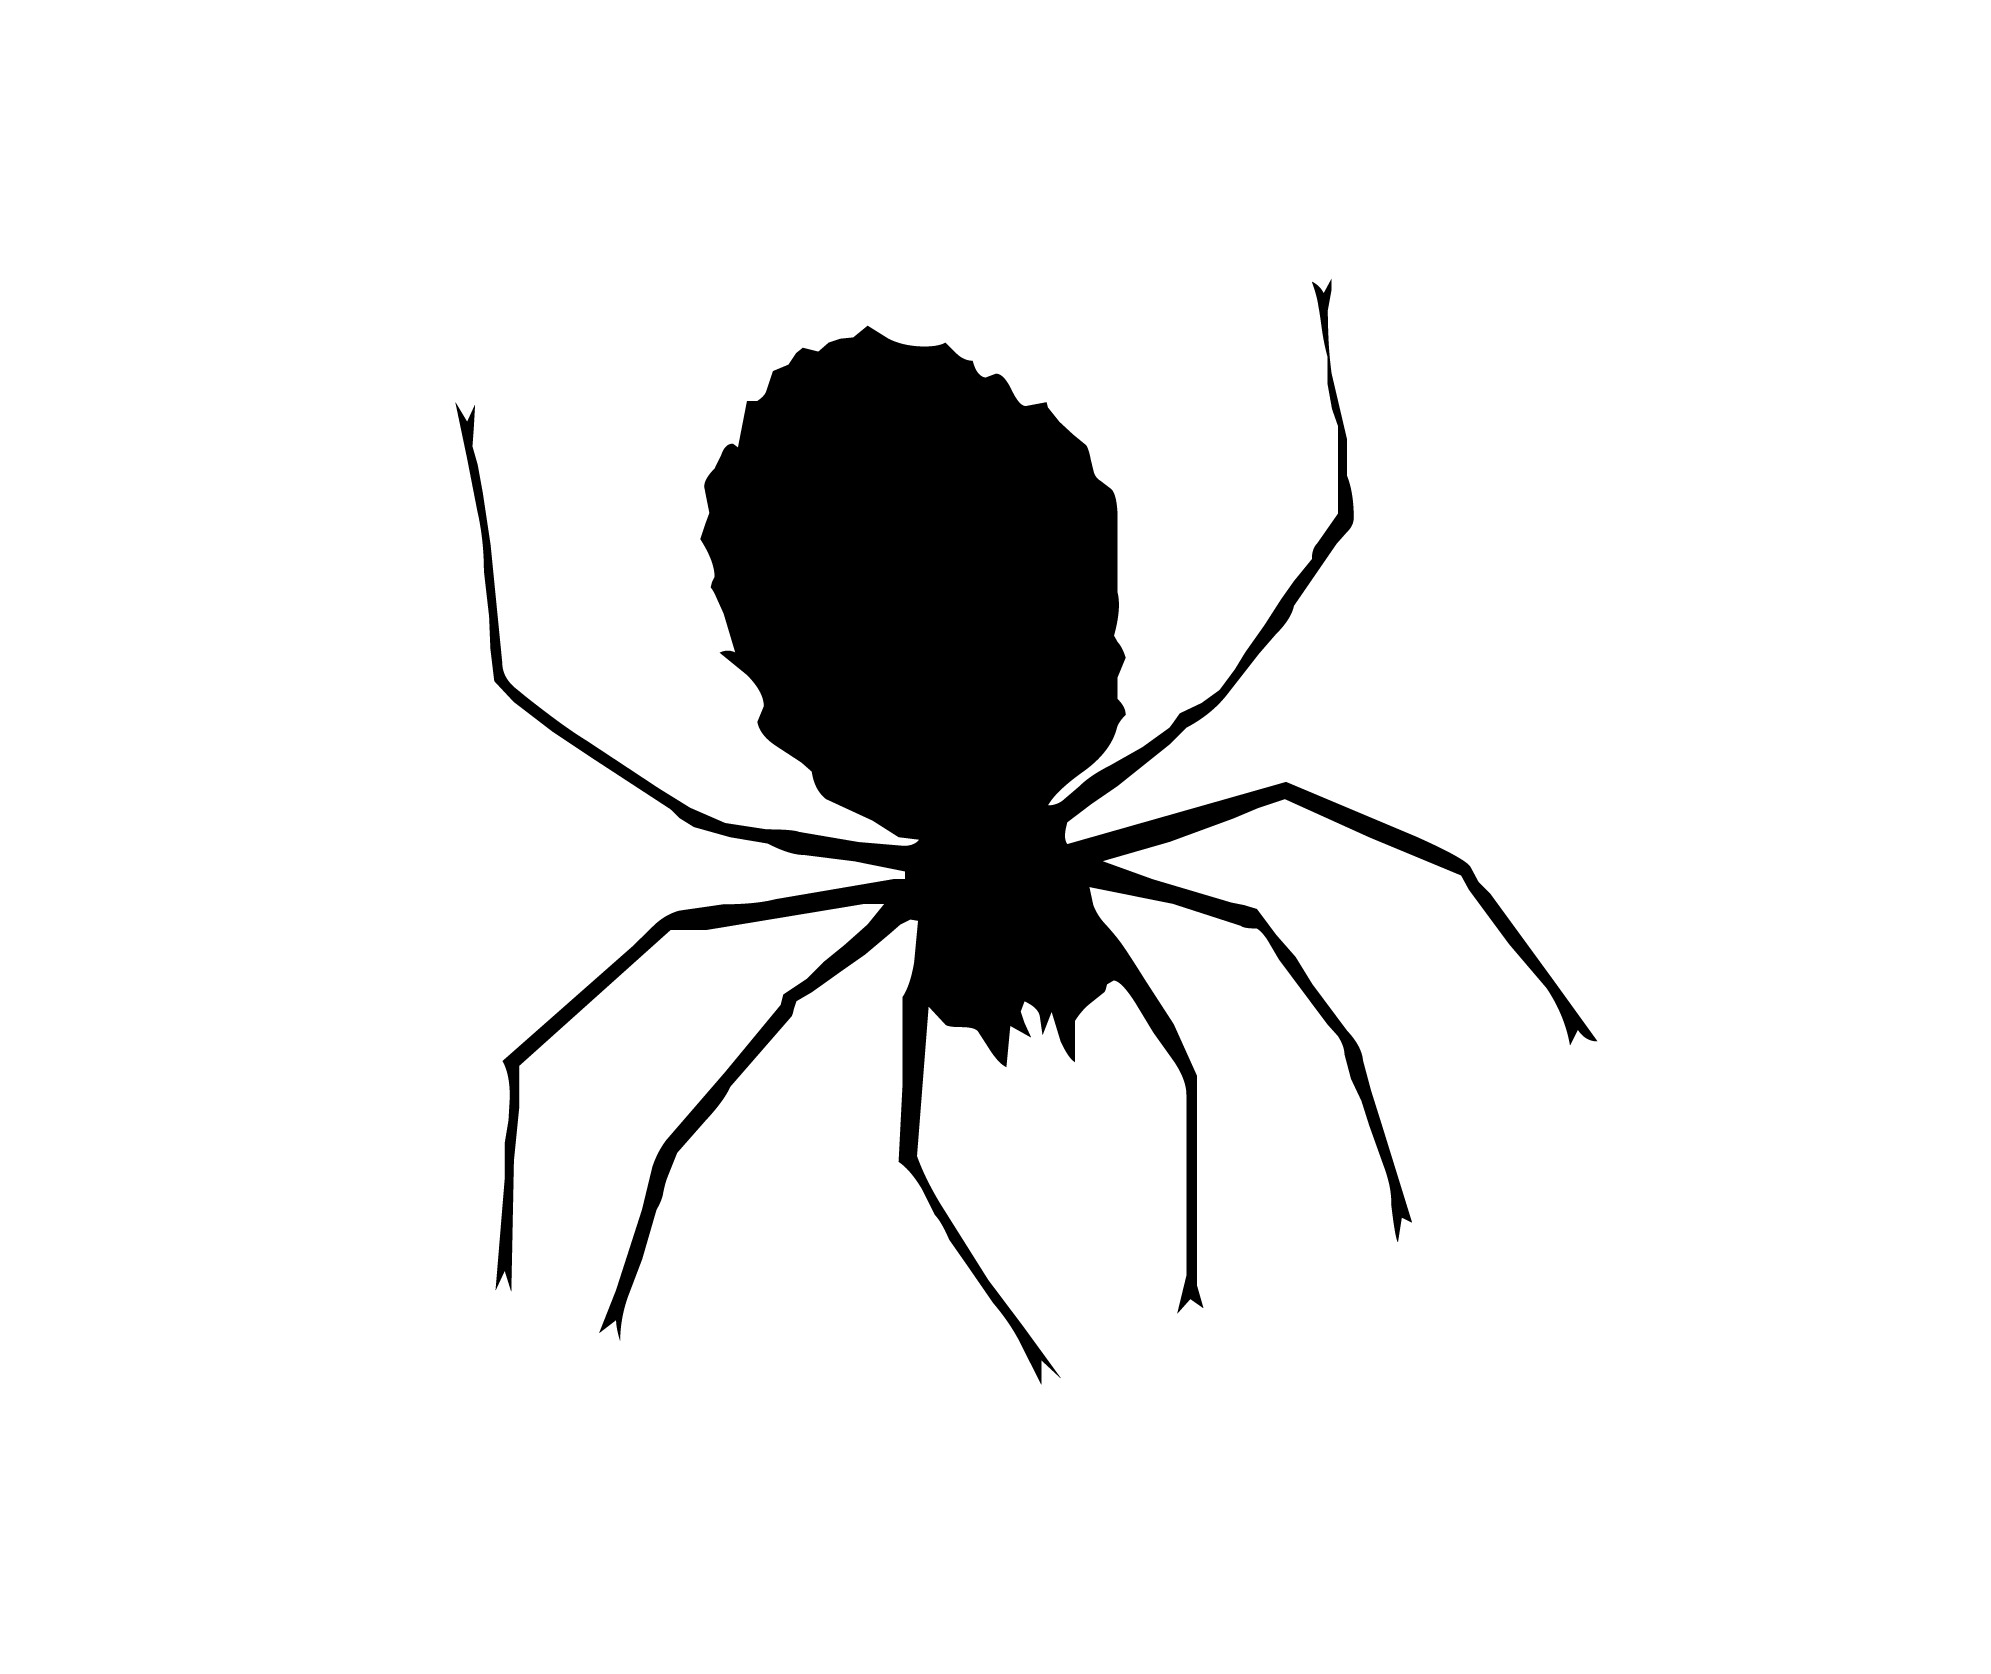 Spider Black And White Black And White Spider Clipart 4